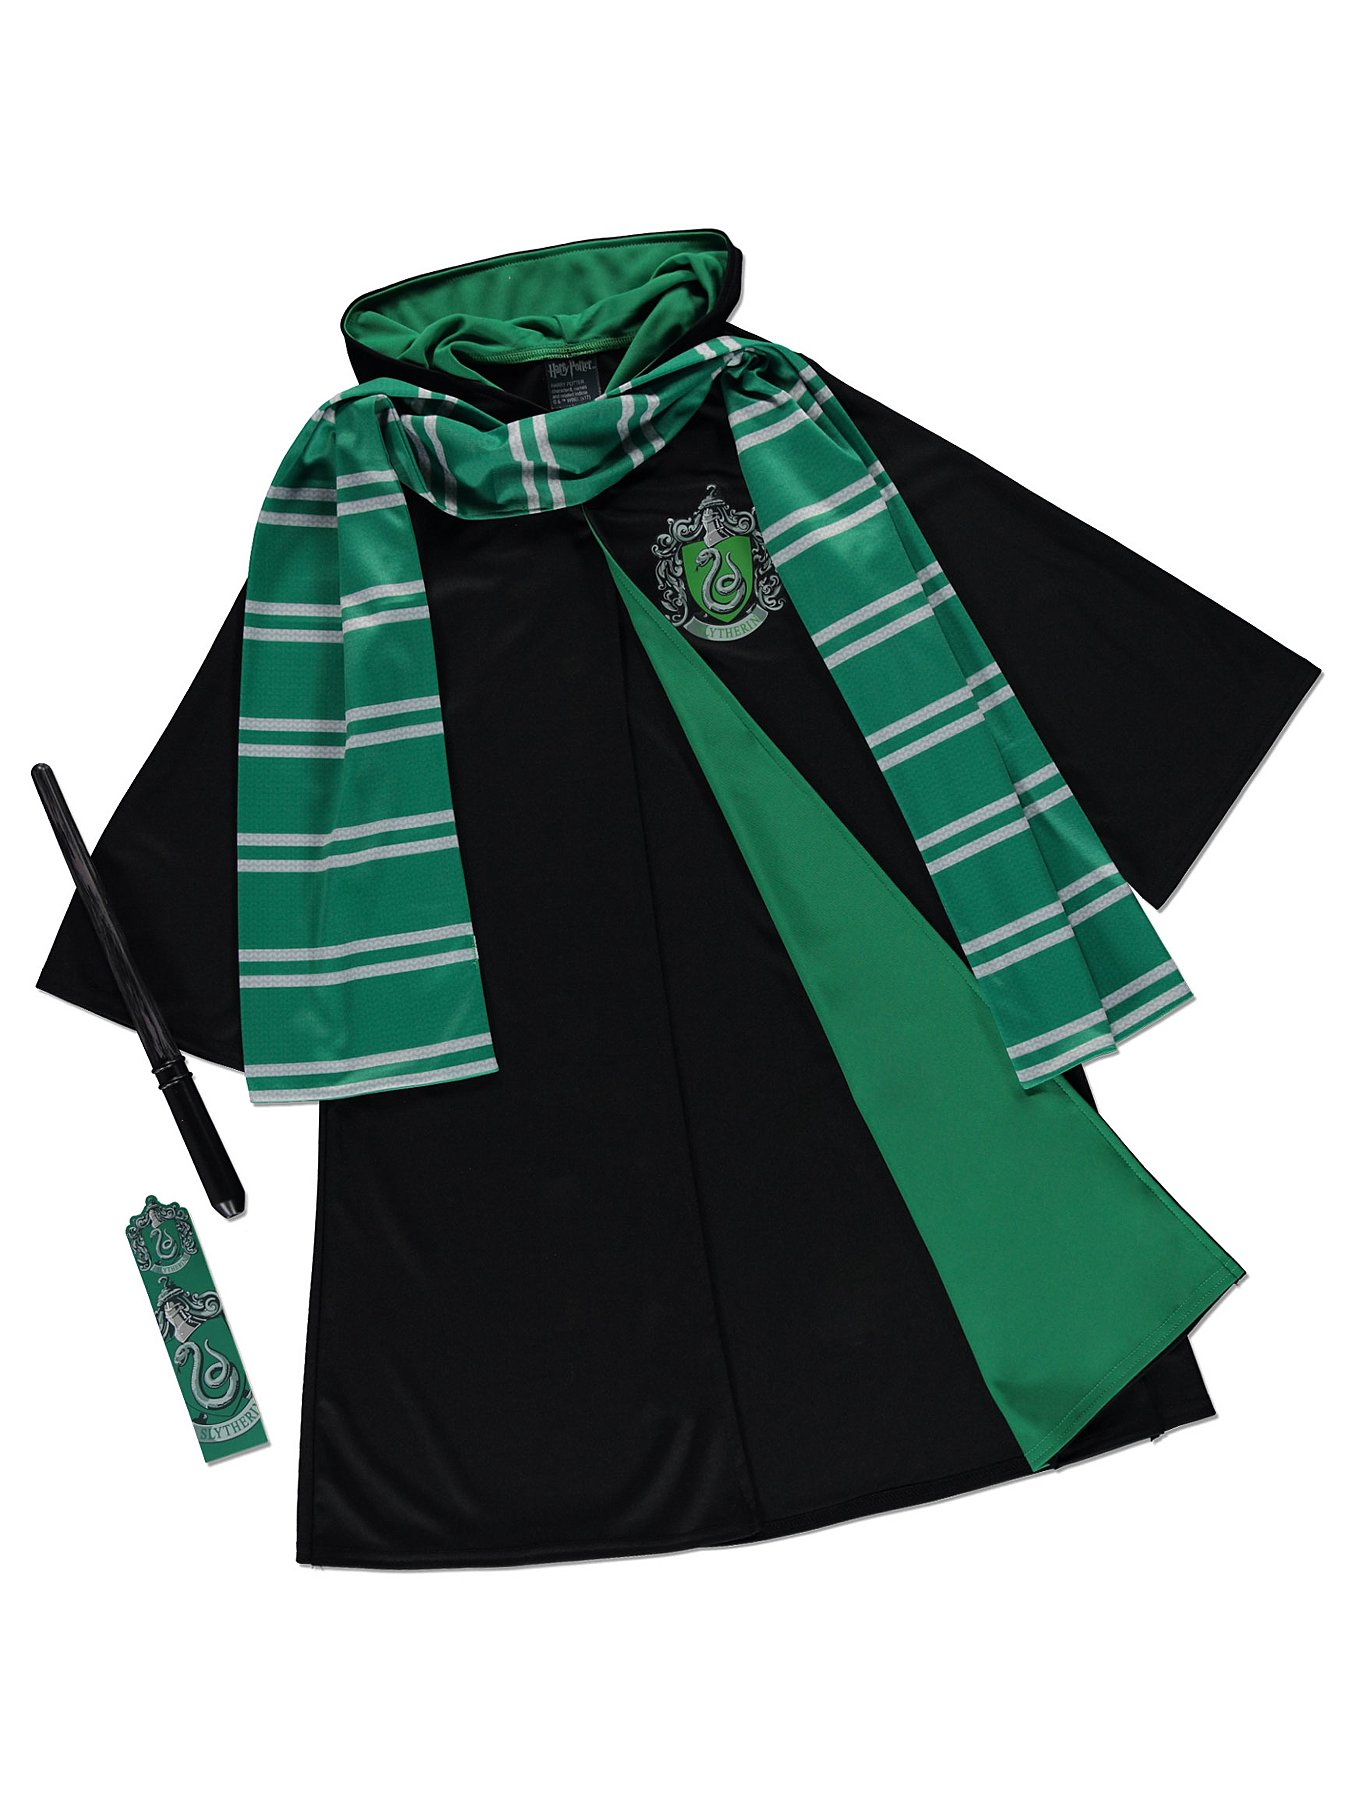 Harry Potter Draco Malfoy Fancy Dress Costume   Kids   George at ASDA